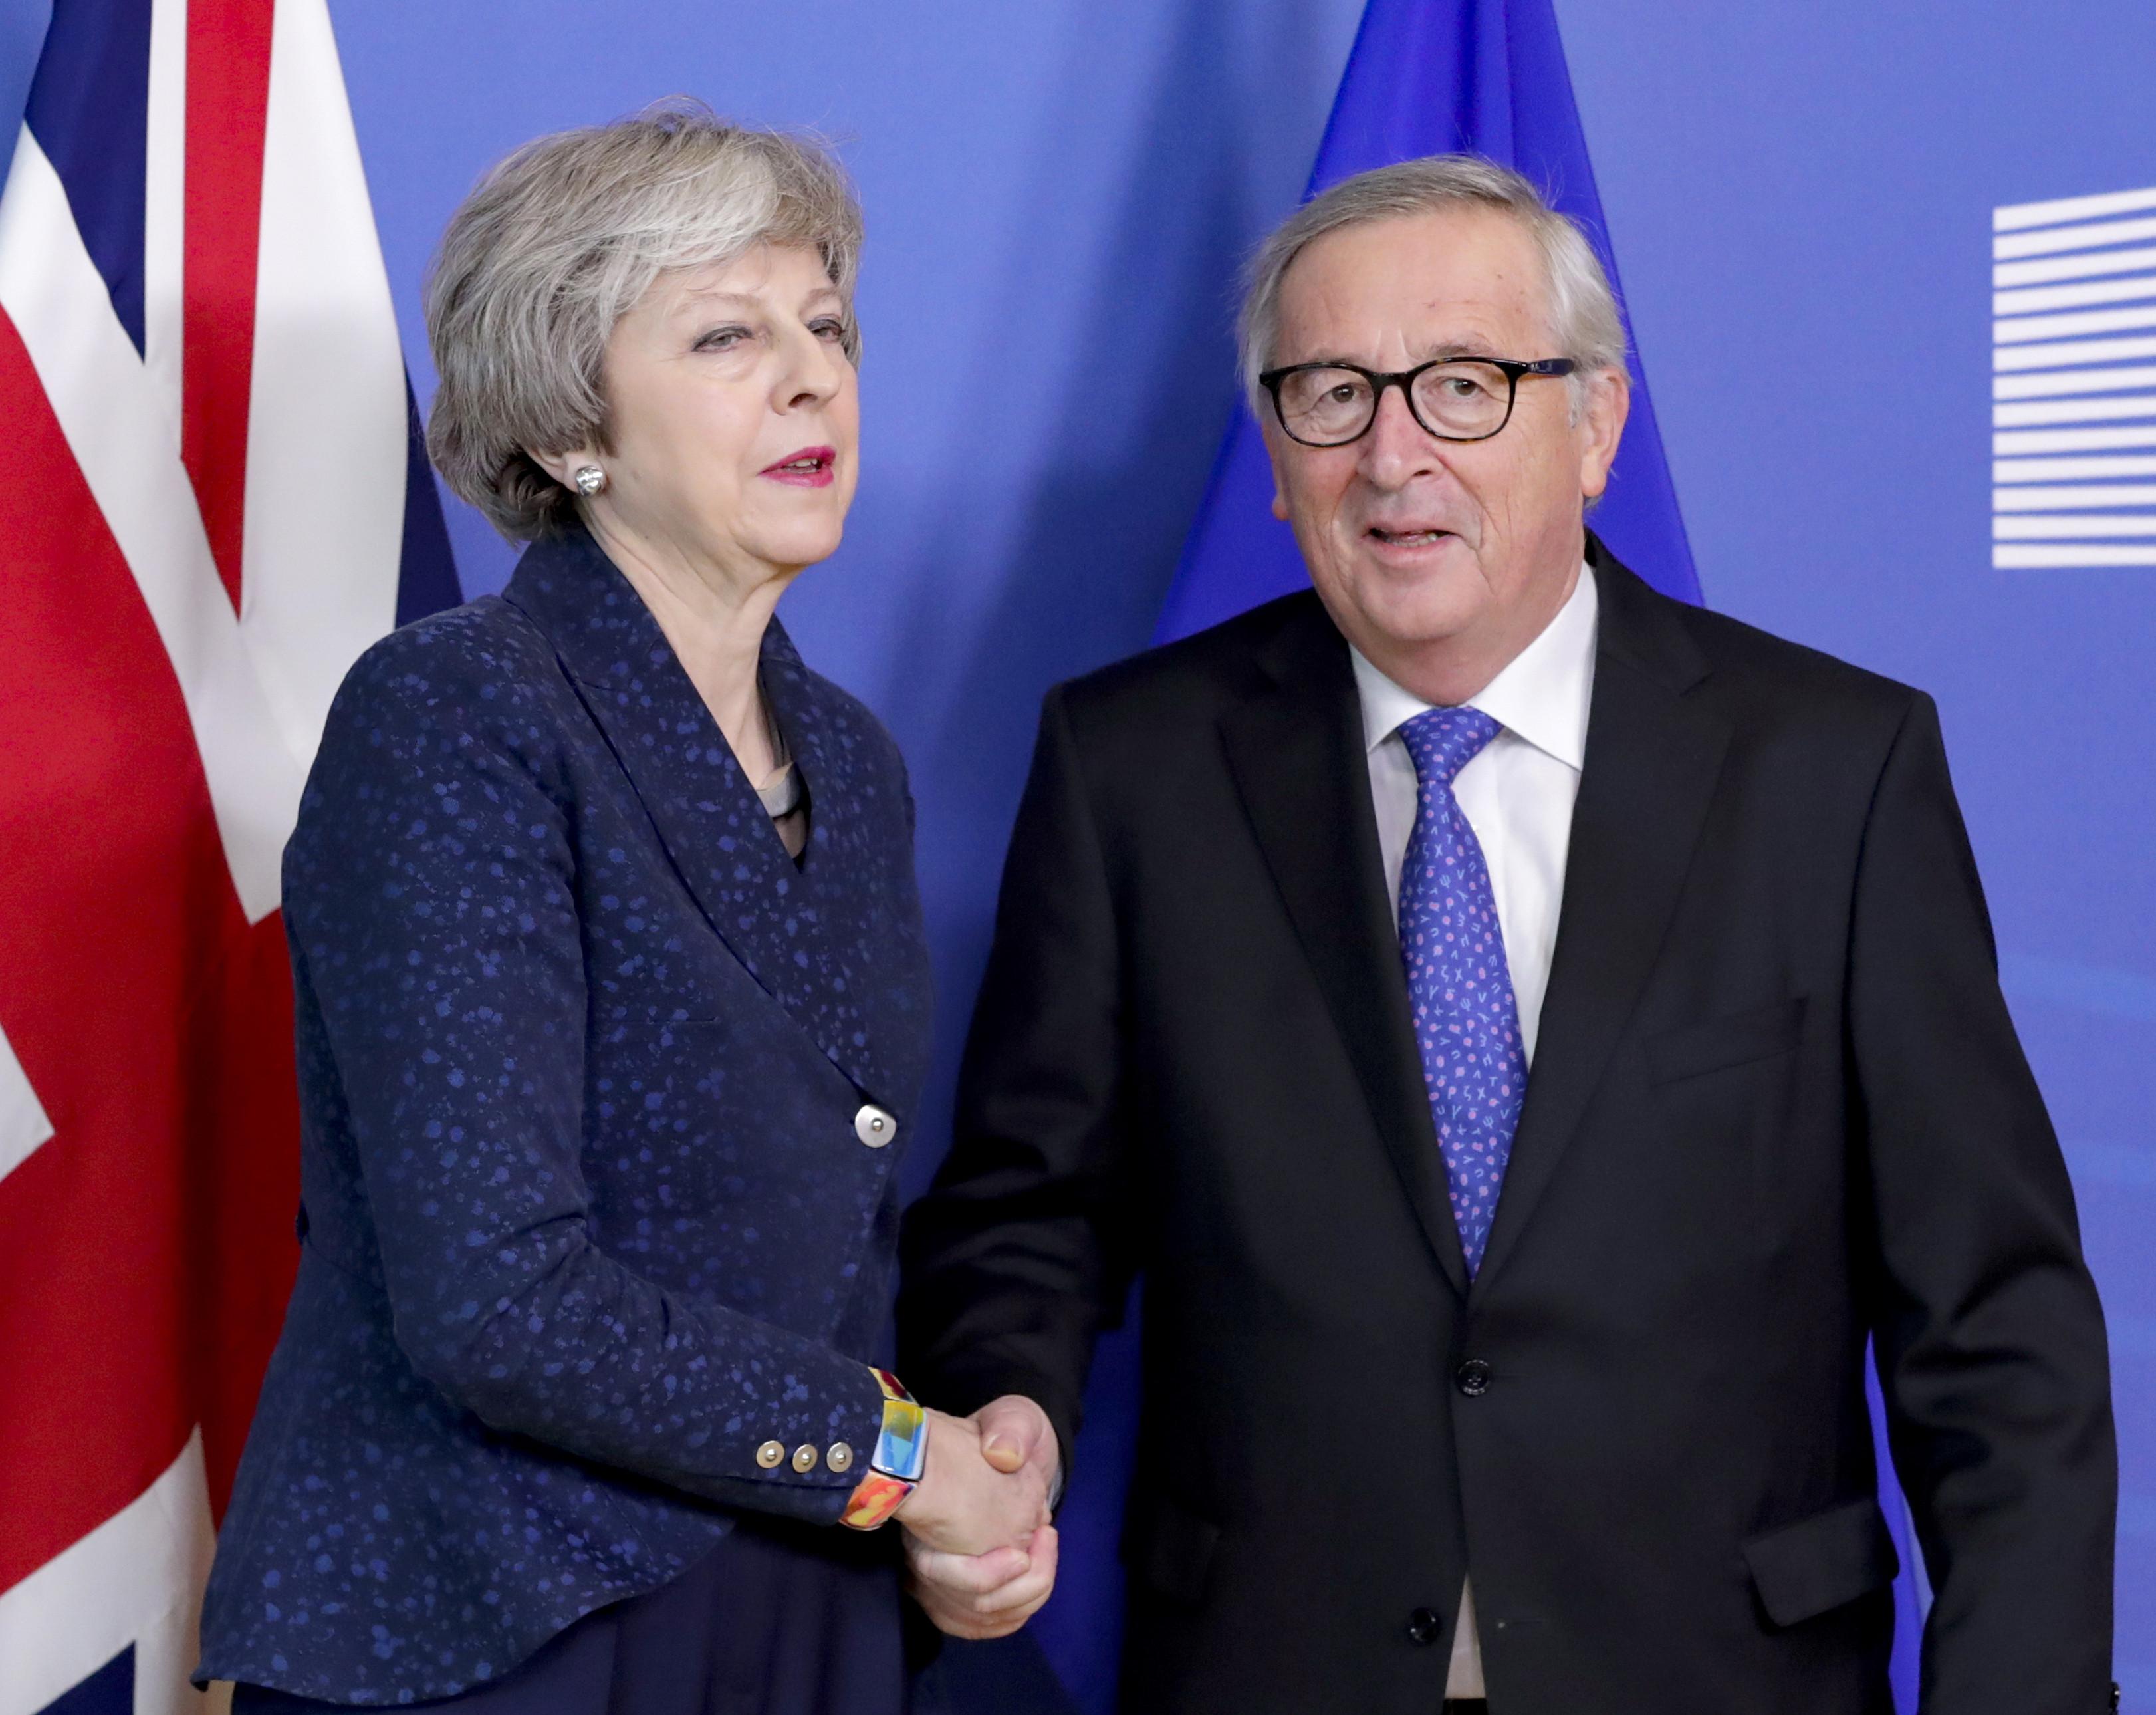 Theresa May reúne-se hoje em Bruxelas com Jean-Claude Juncker